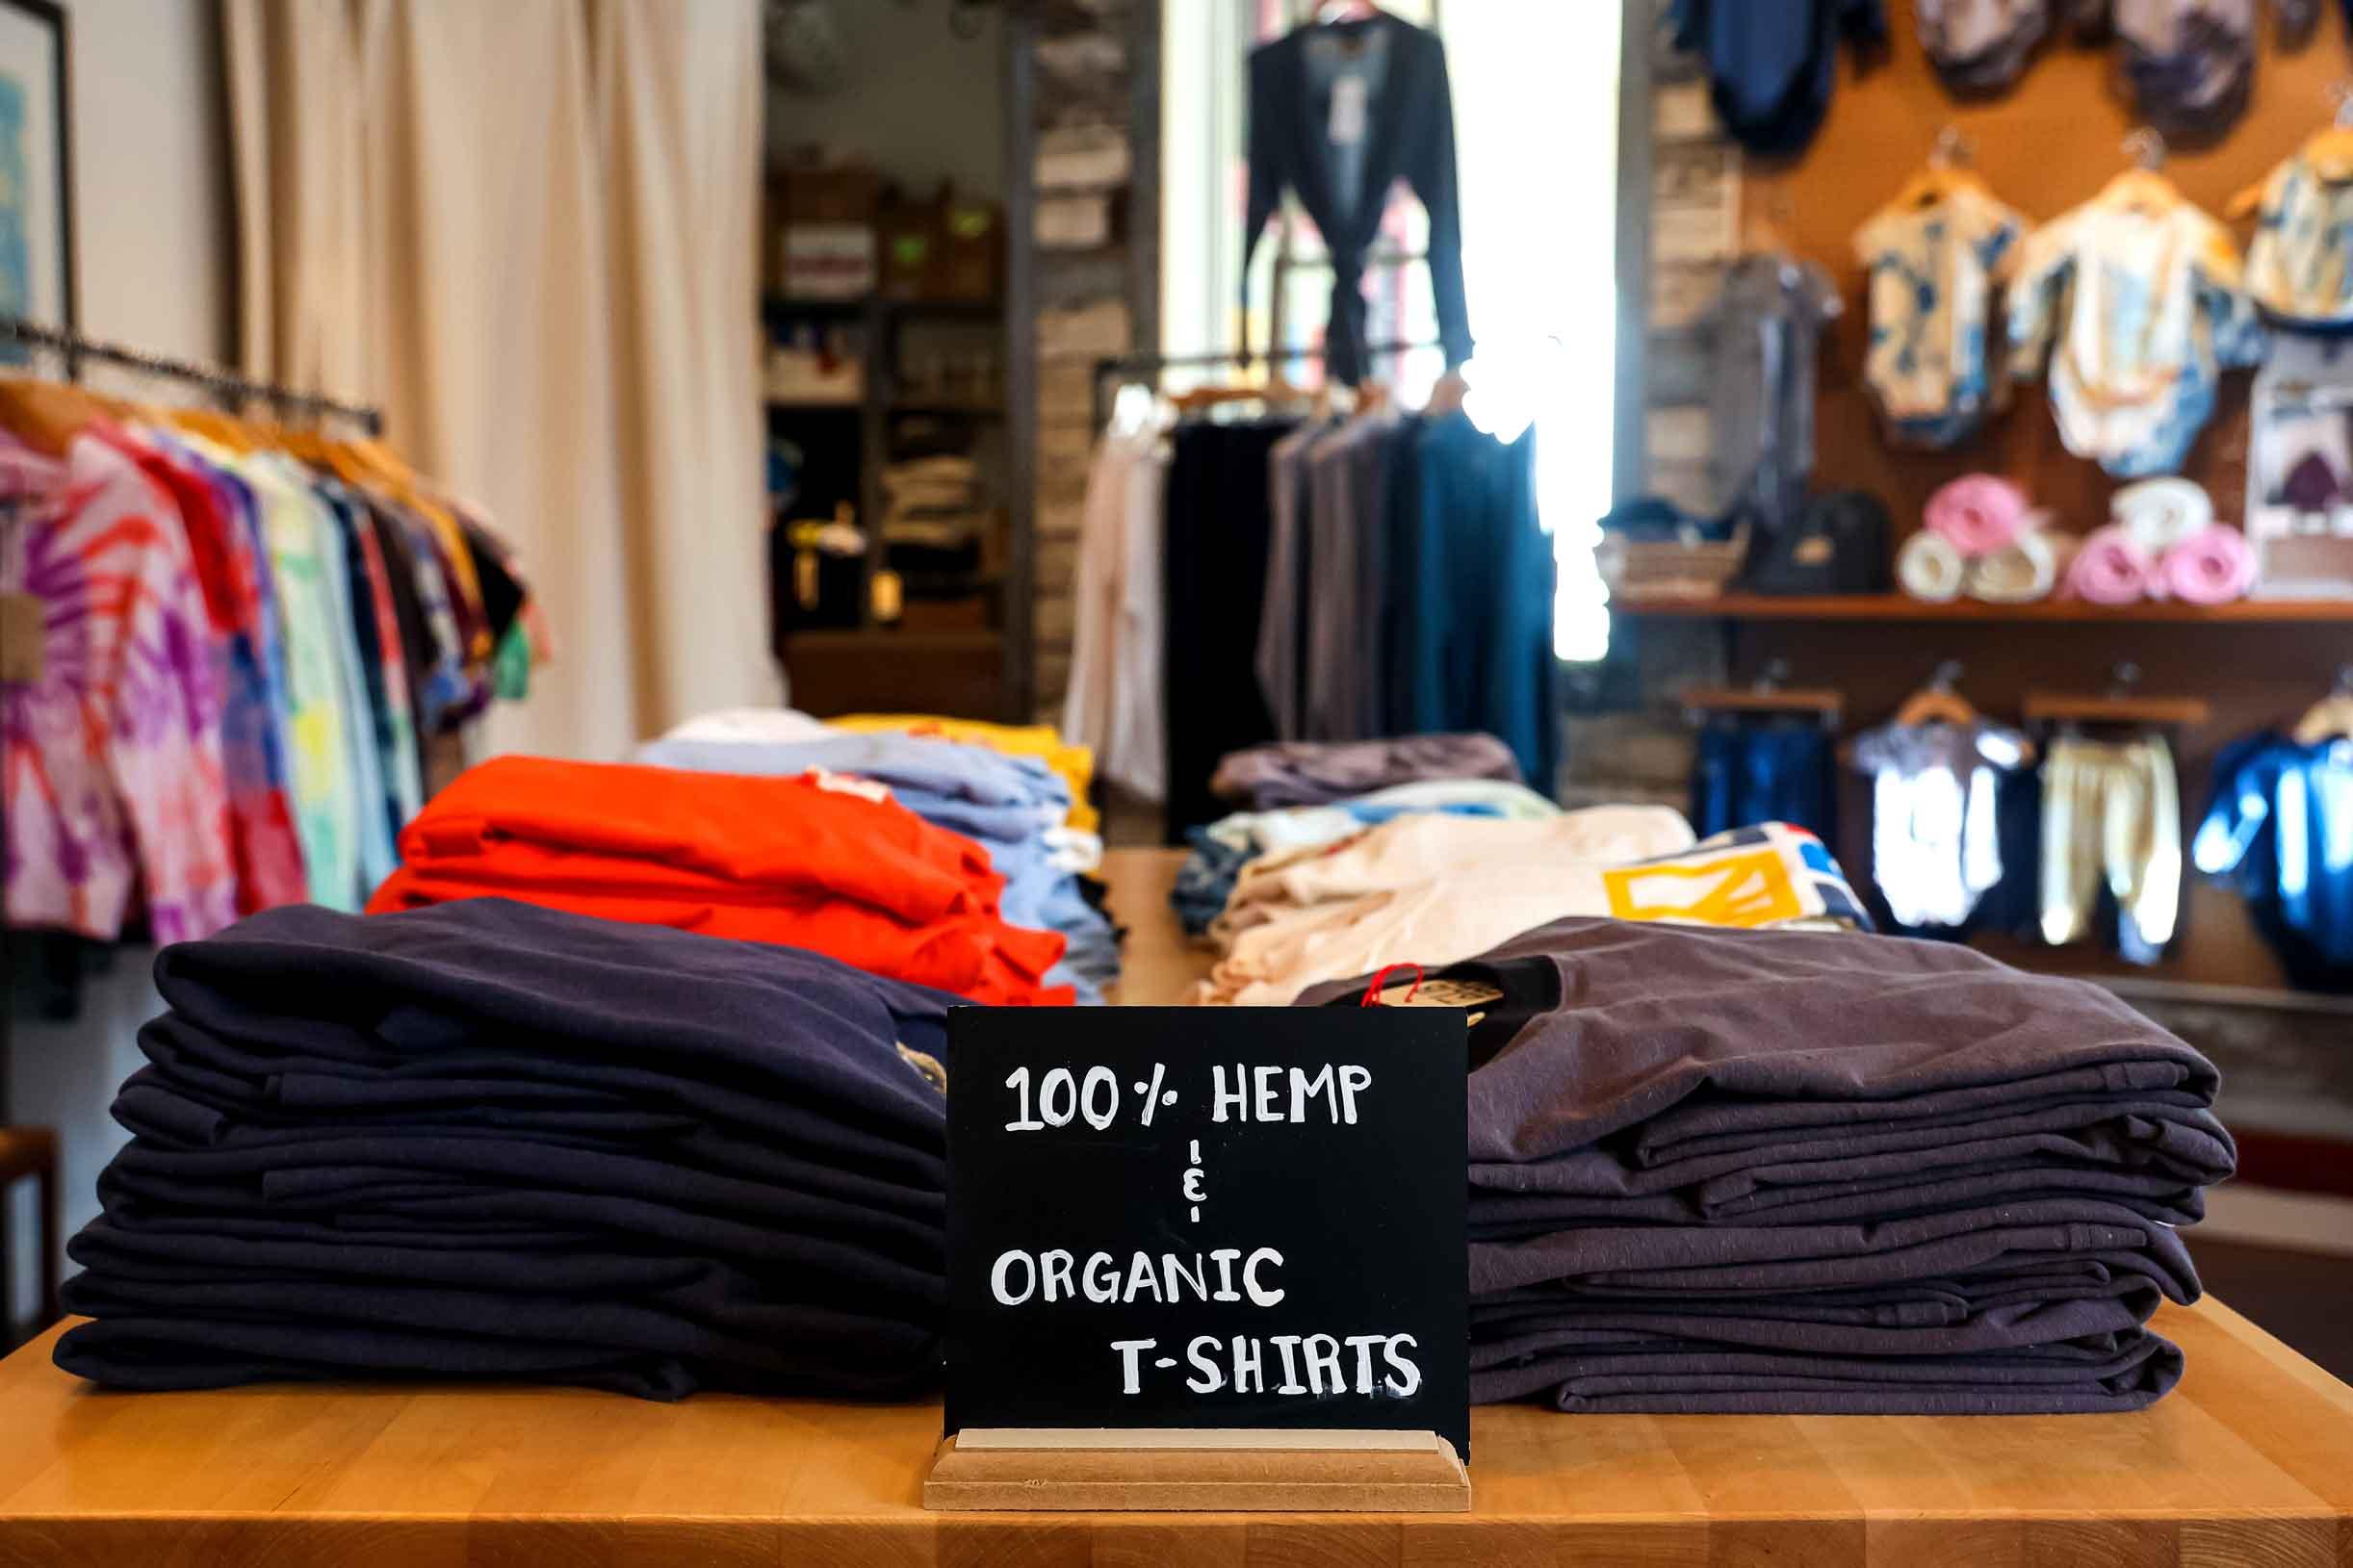 100% Hemp and Organic t-shirts at Liberty Clothing. Photo by Katharyn Sotvedt